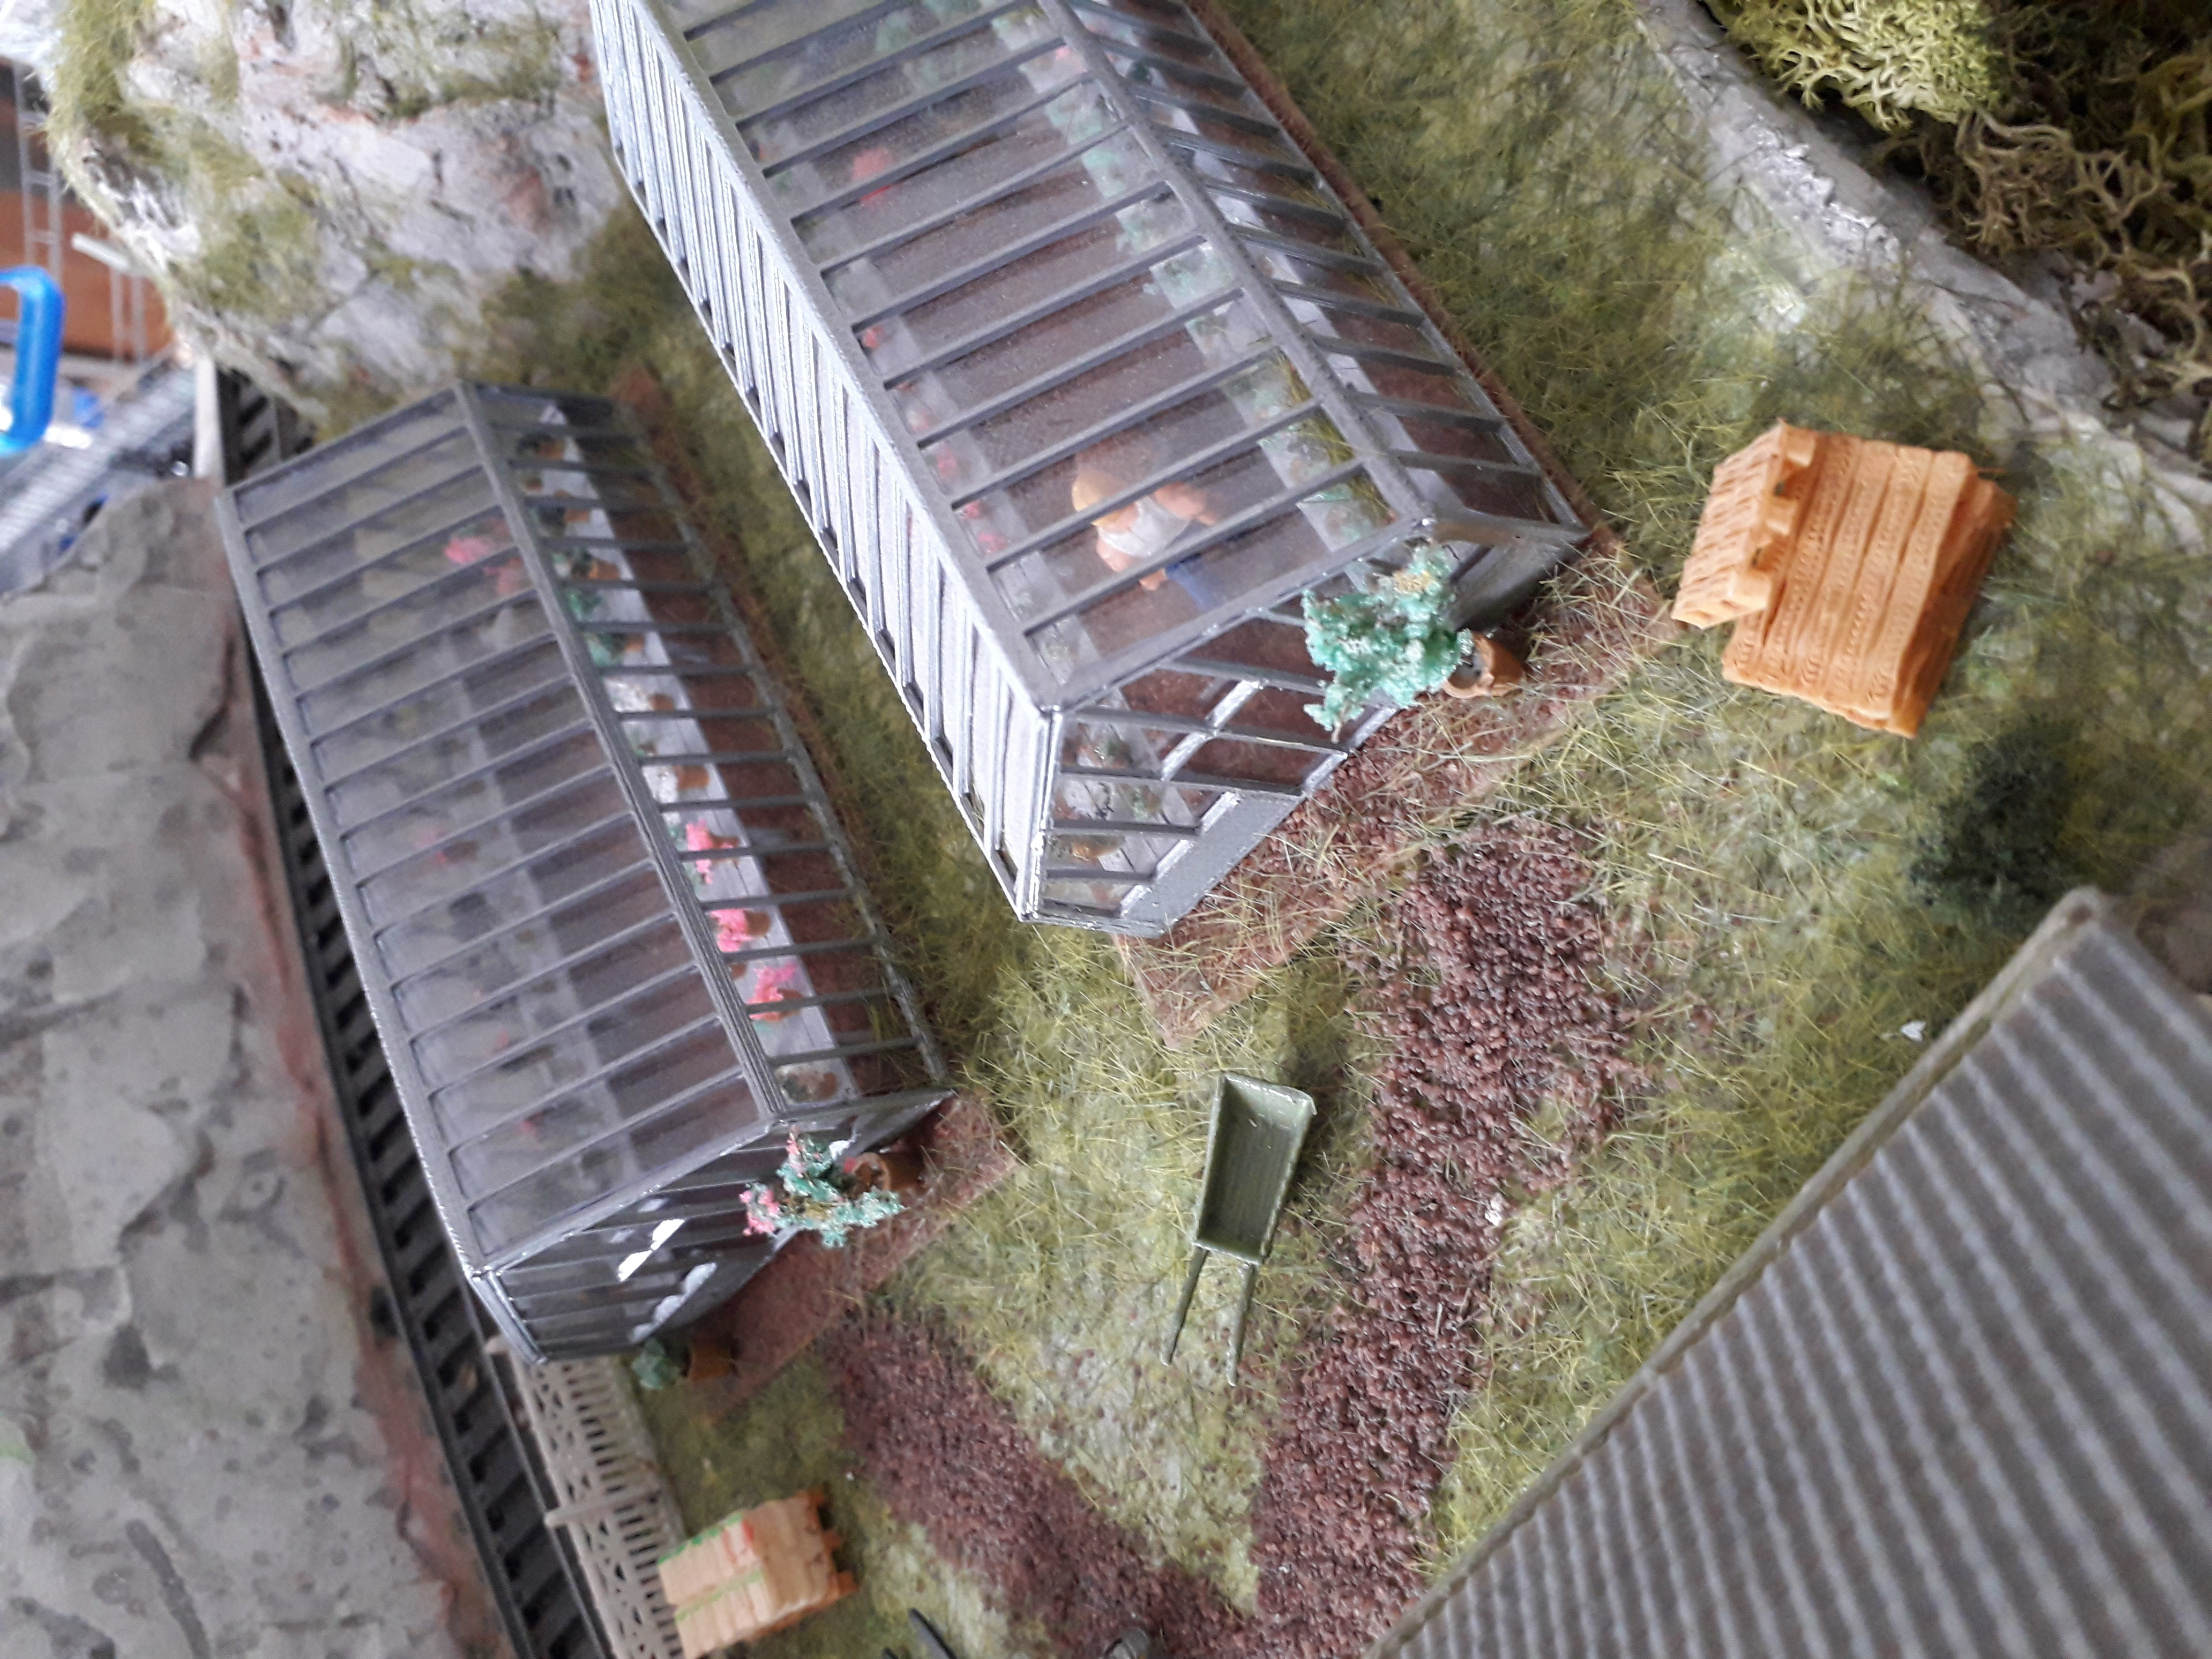 20200323_083606.jpg Download STL file Set of greenhouses, well, wheelbarrow, shovel, rake and vases for your garden in HO • Design to 3D print, dede34500